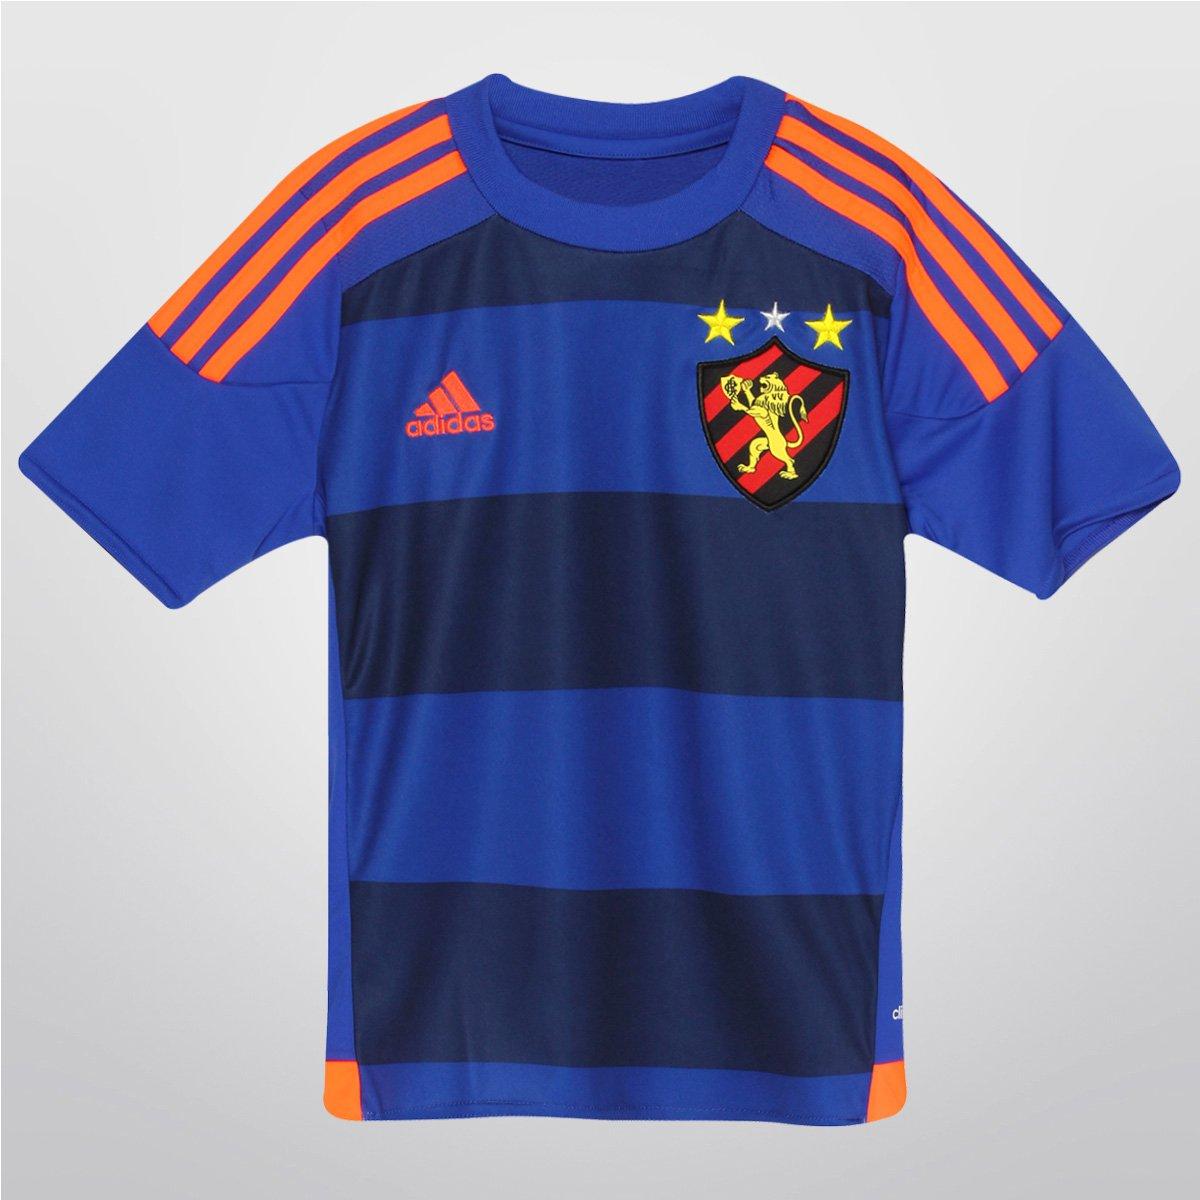 be2ec5ada4 Camisa Adidas Sport Recife III 15 16 s nº Infantil - Compre Agora ...